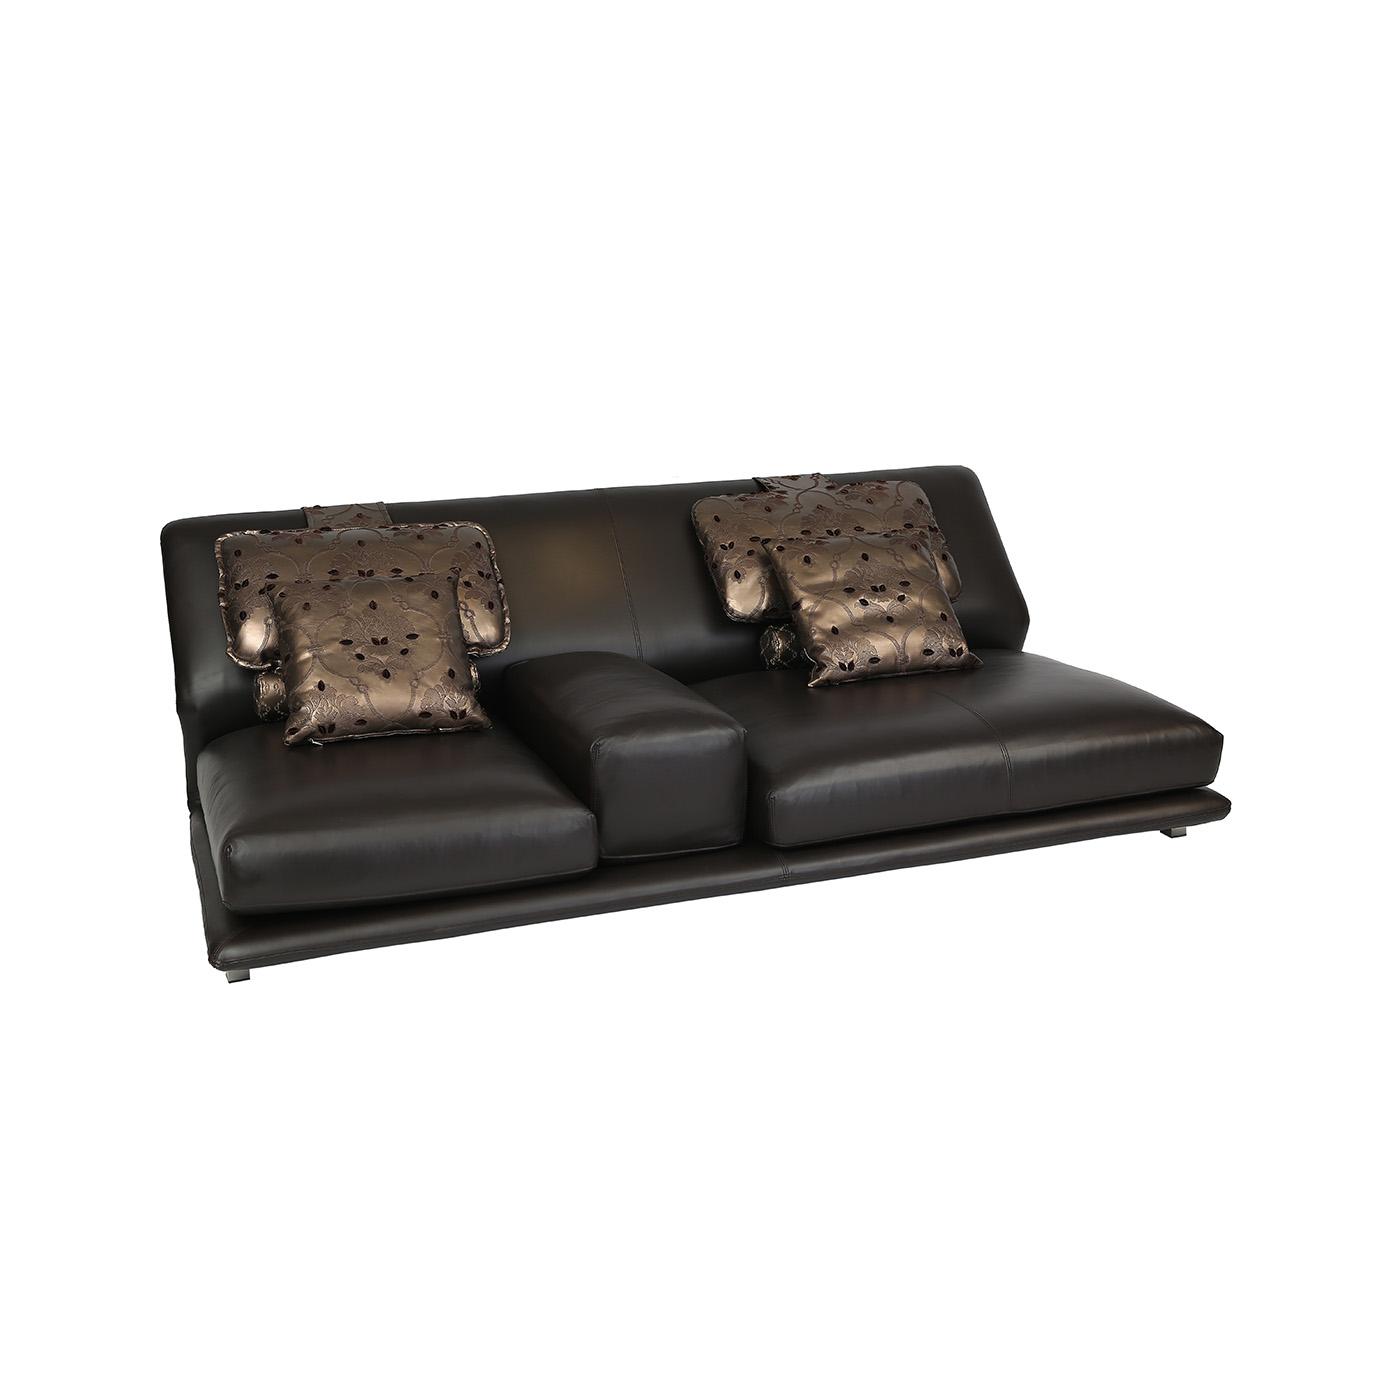 Casper Sofa Coomo